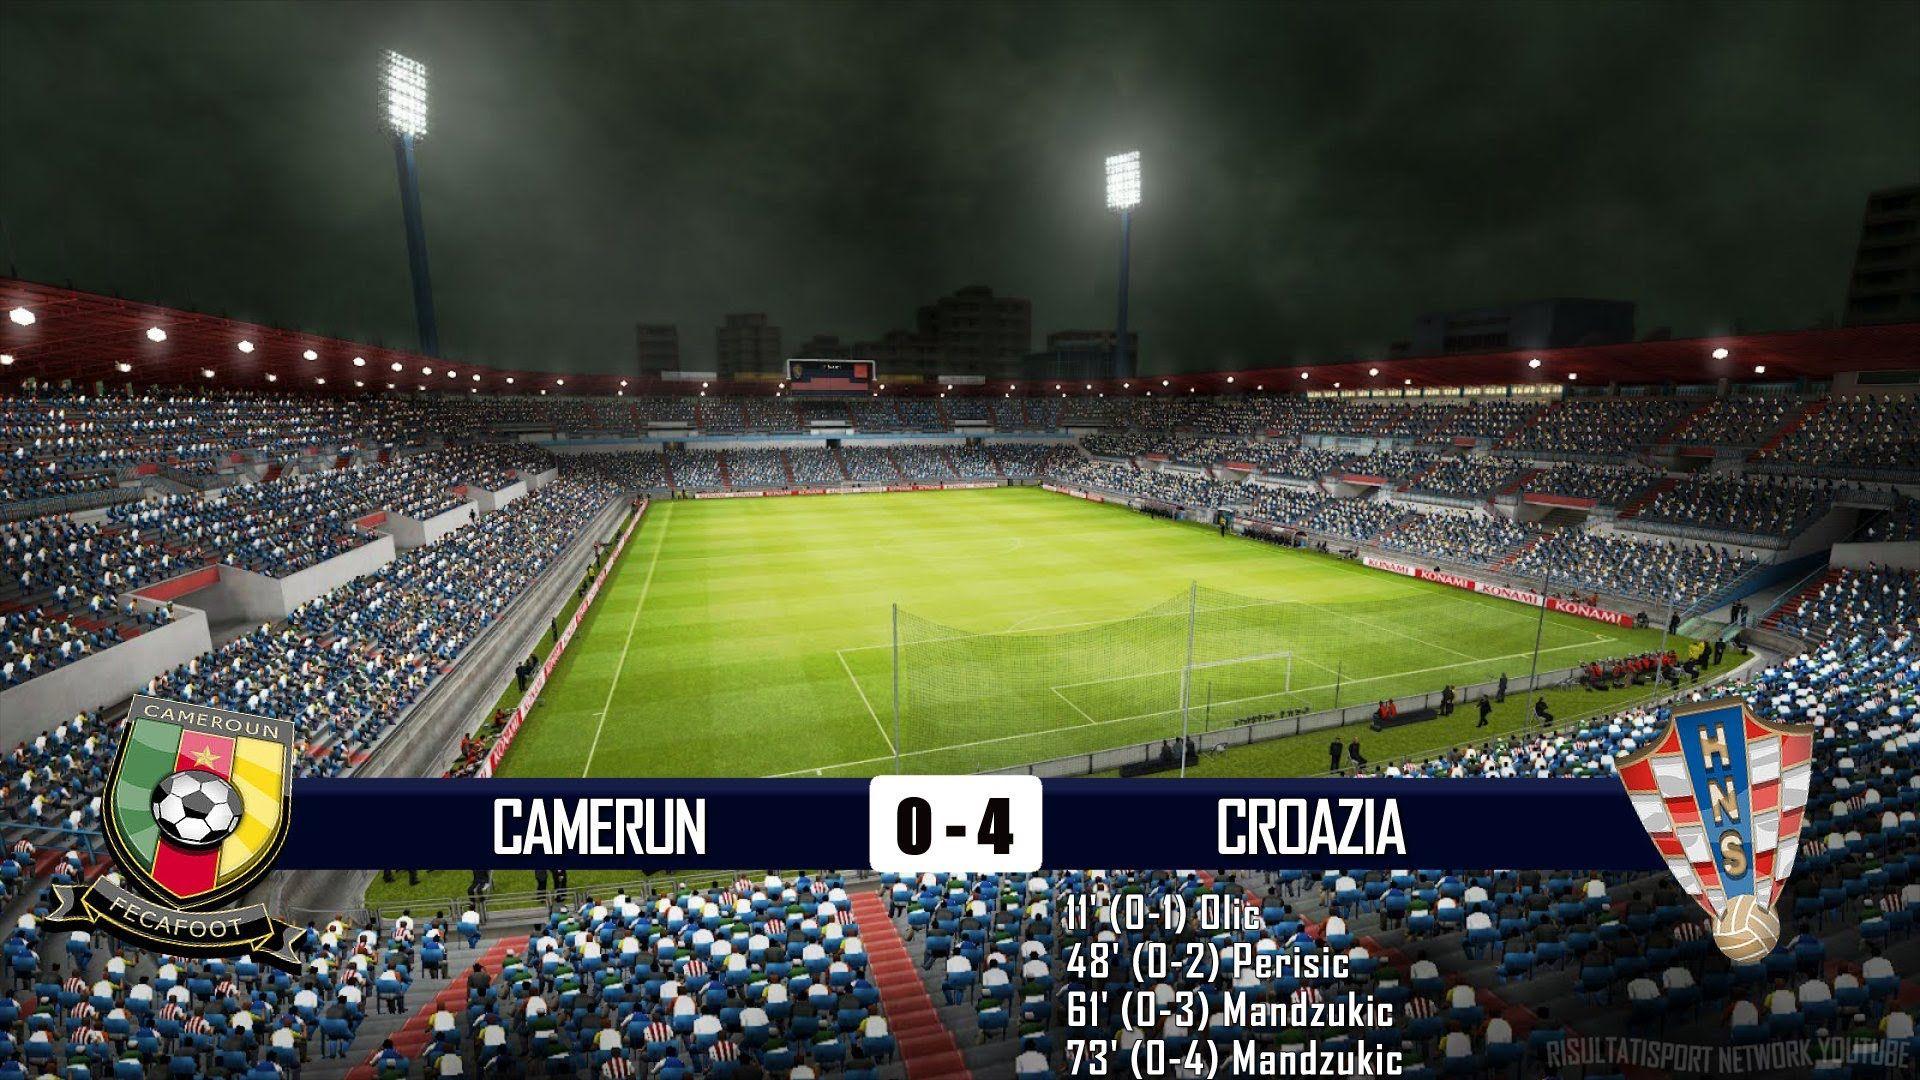 CAMERUN - CROAZIA 0-4 - MONDIALI BRASILE 2014 - 19-6-2014 - SCHEDA TECNICA